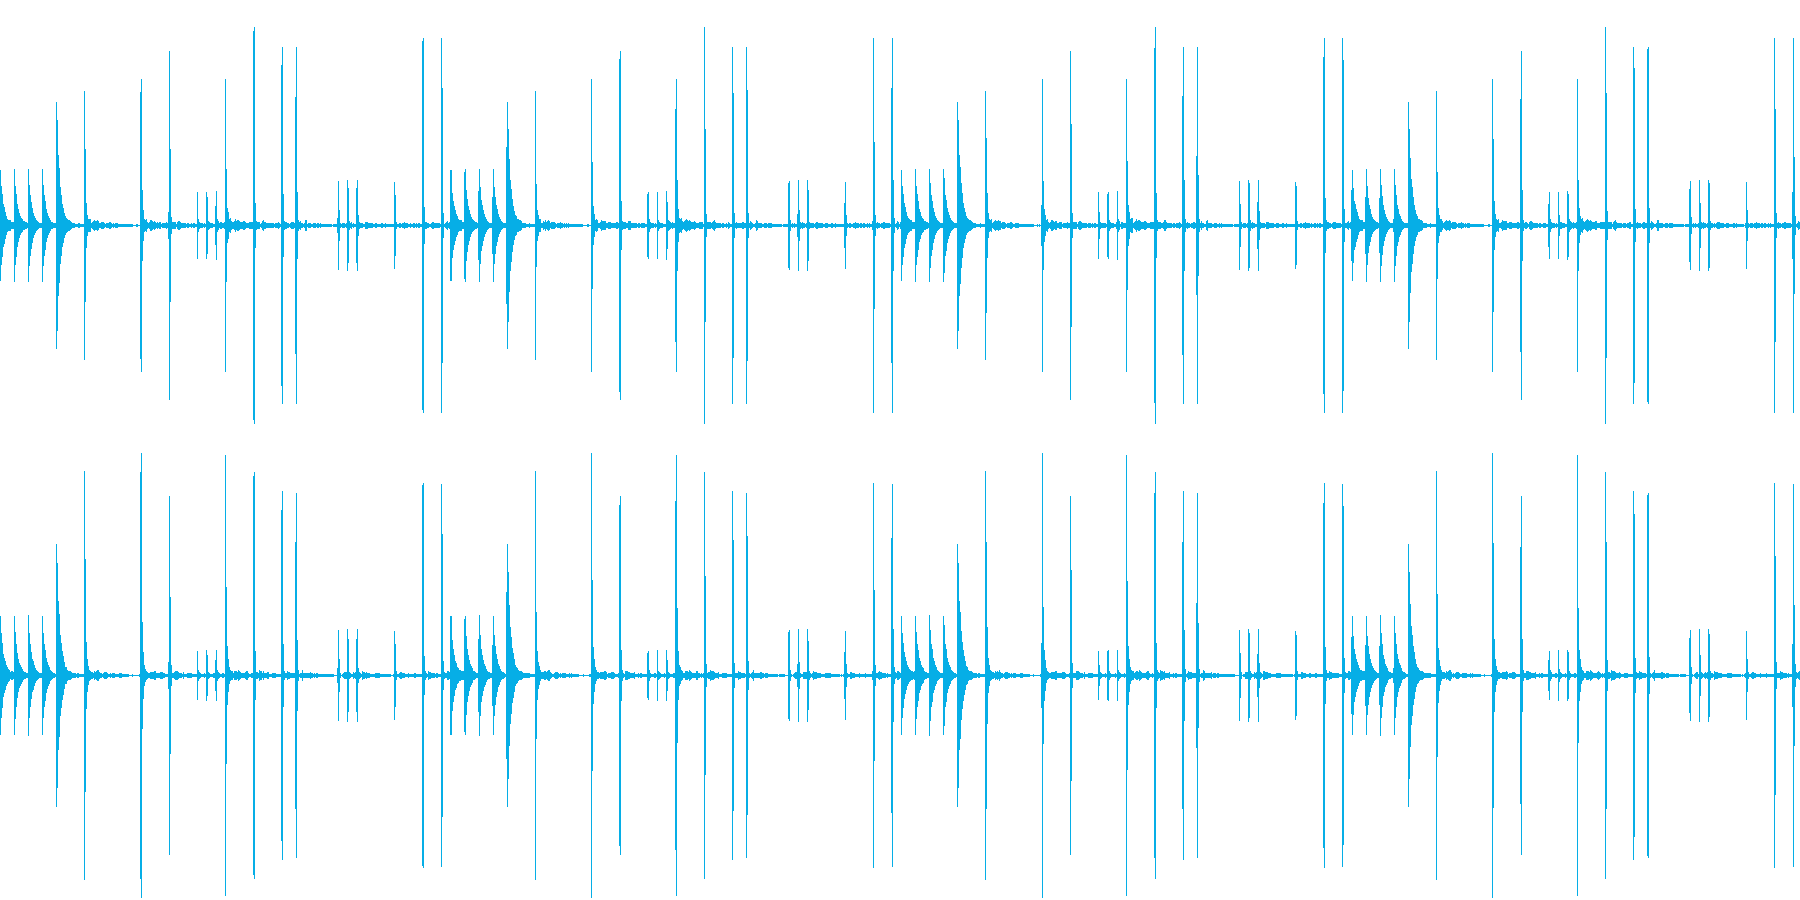 WoodBlocks 尾行のテーマの再生済みの波形